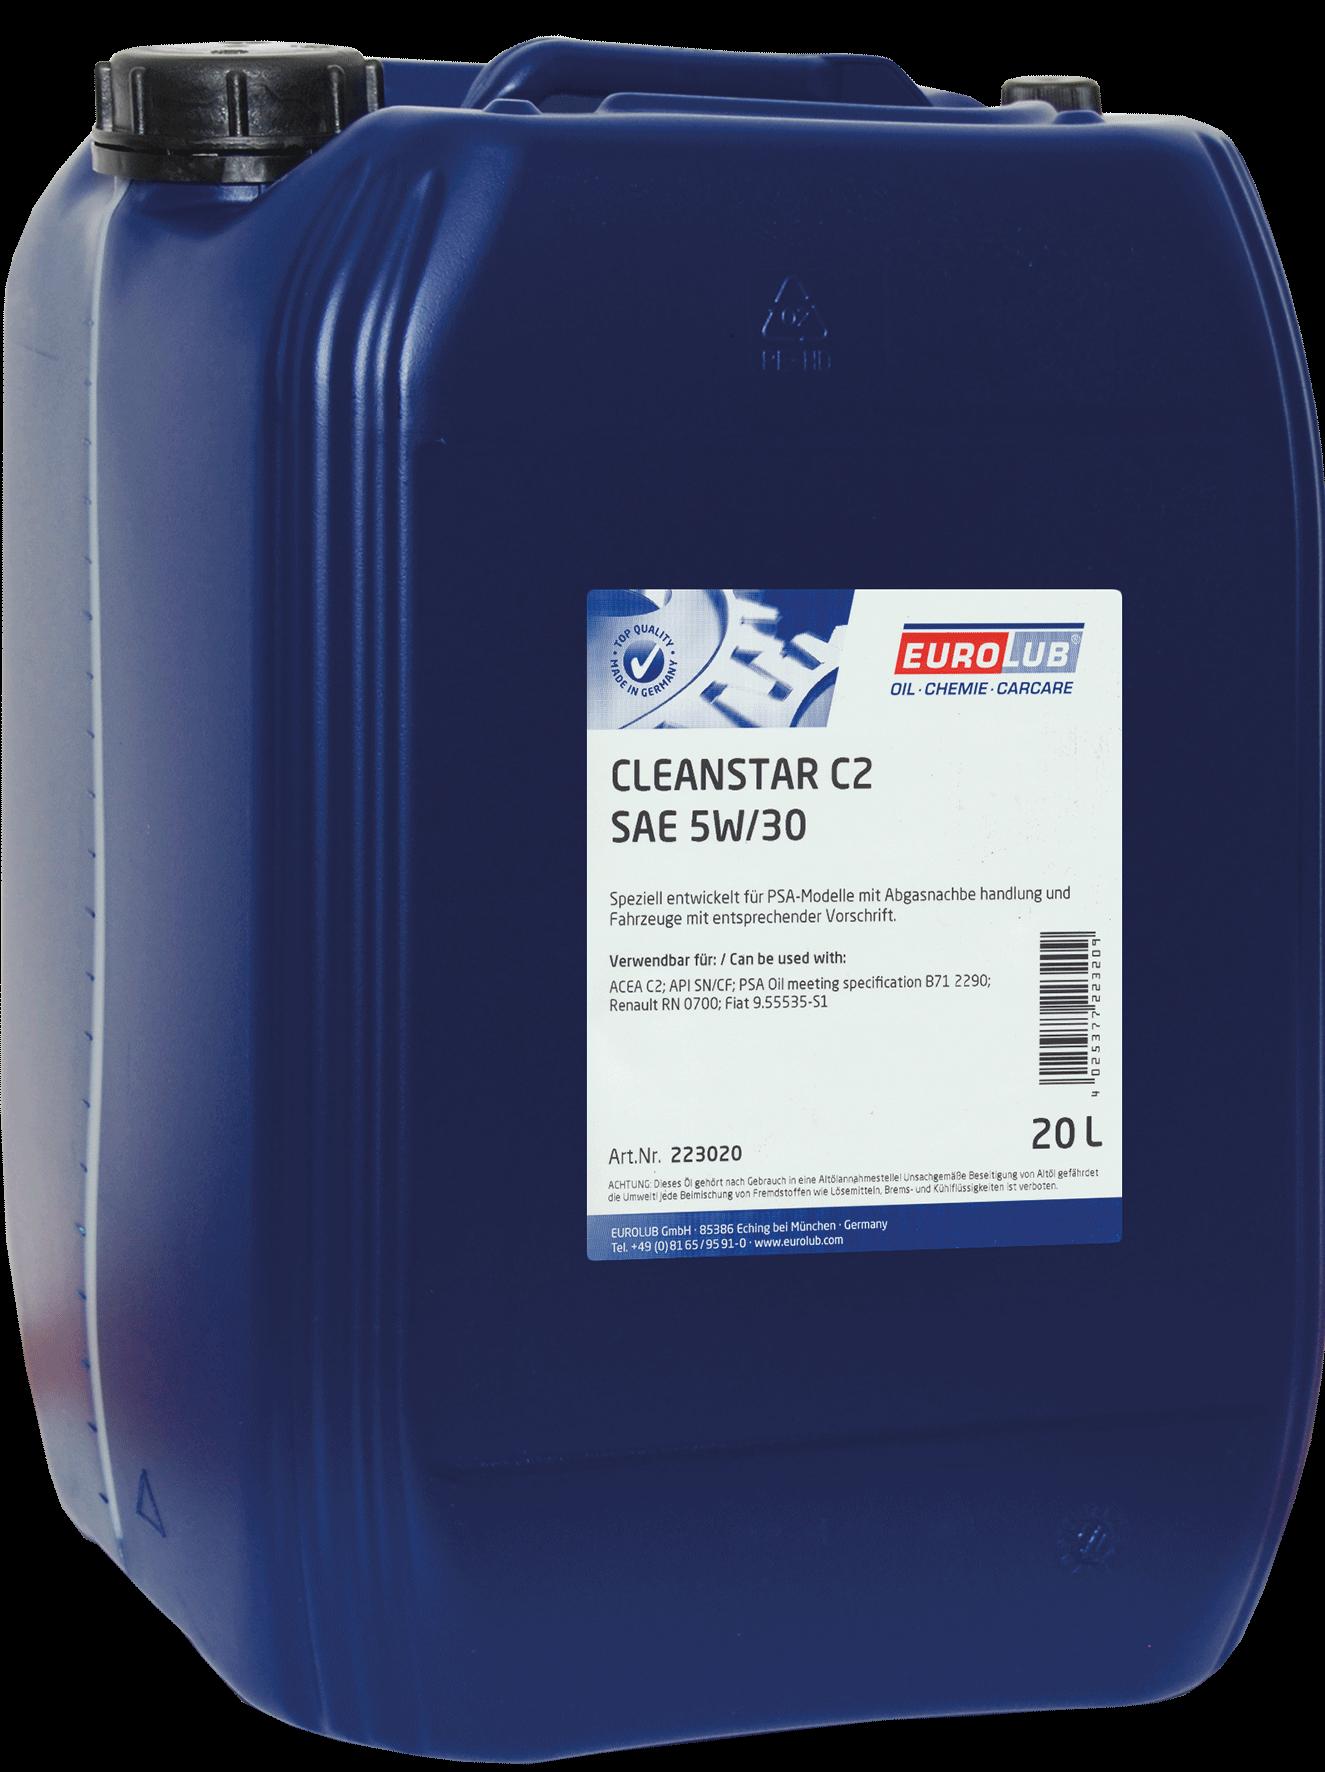 EUROLUB CLEANSTAR C2, SAE 5W/30, (синтетическое, Mid SAPS), 20л